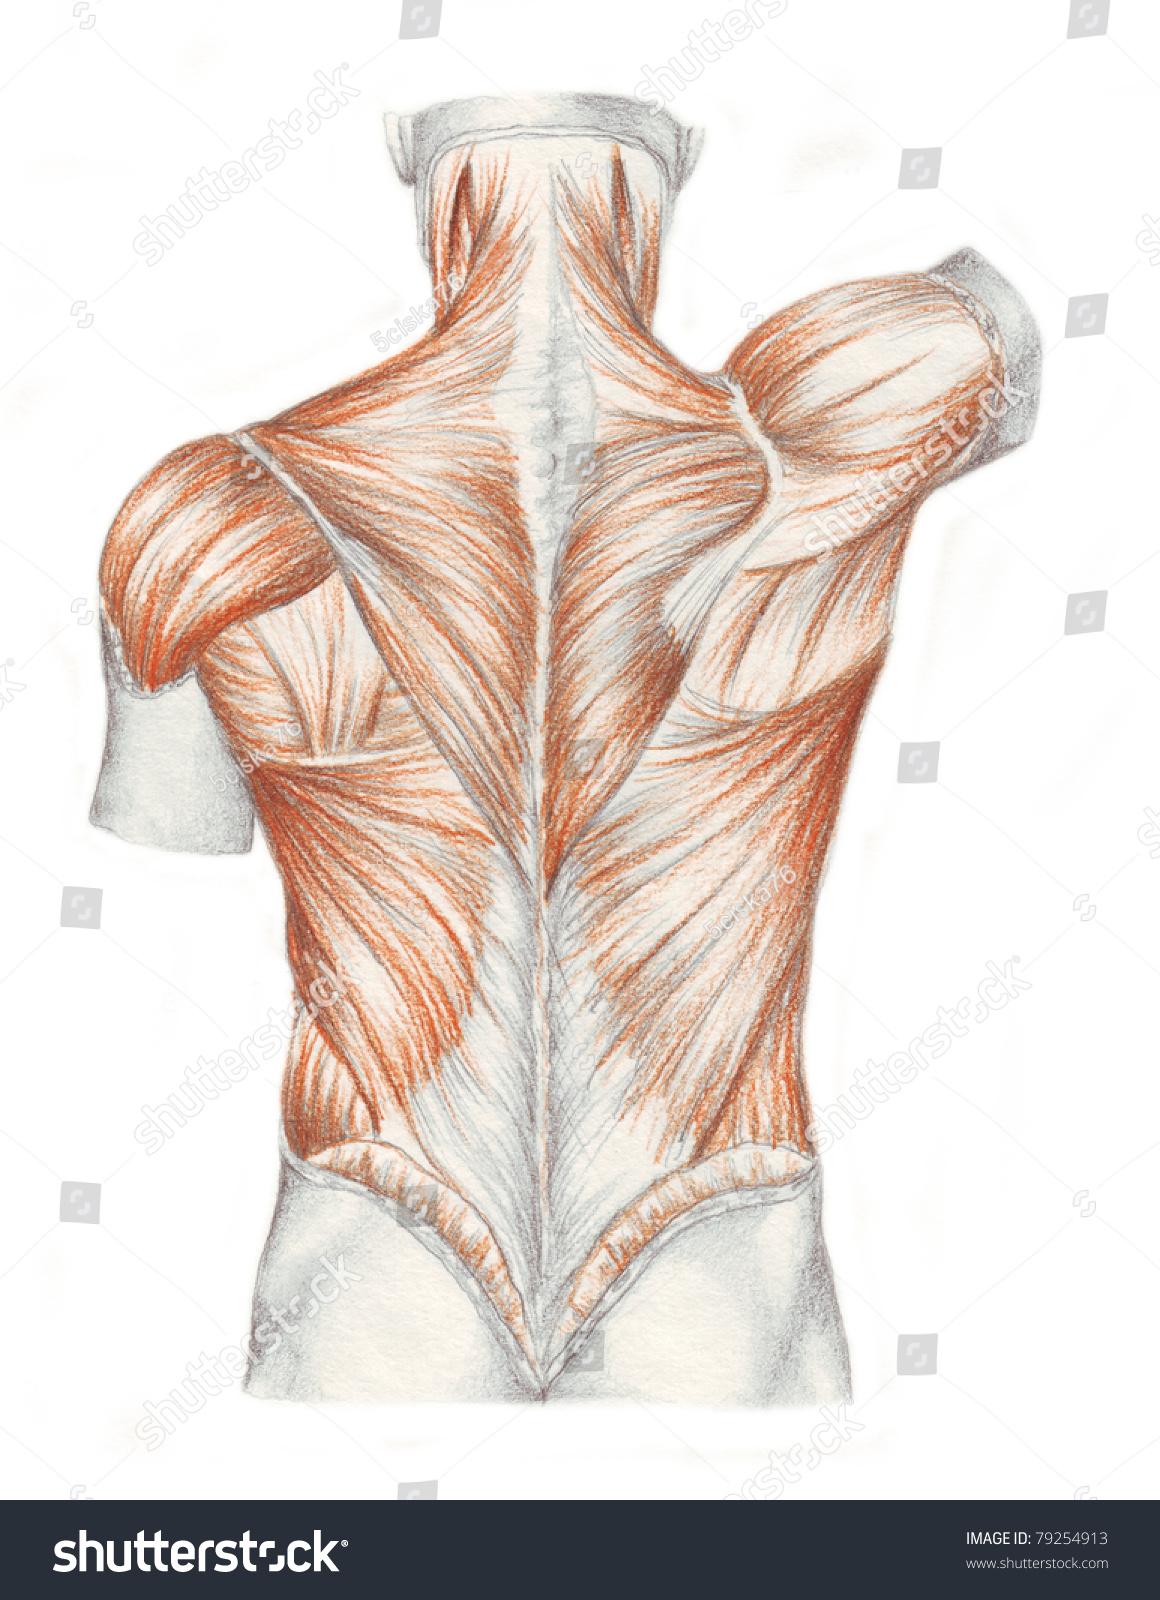 Human Muscle Back Anatomy Kefei04